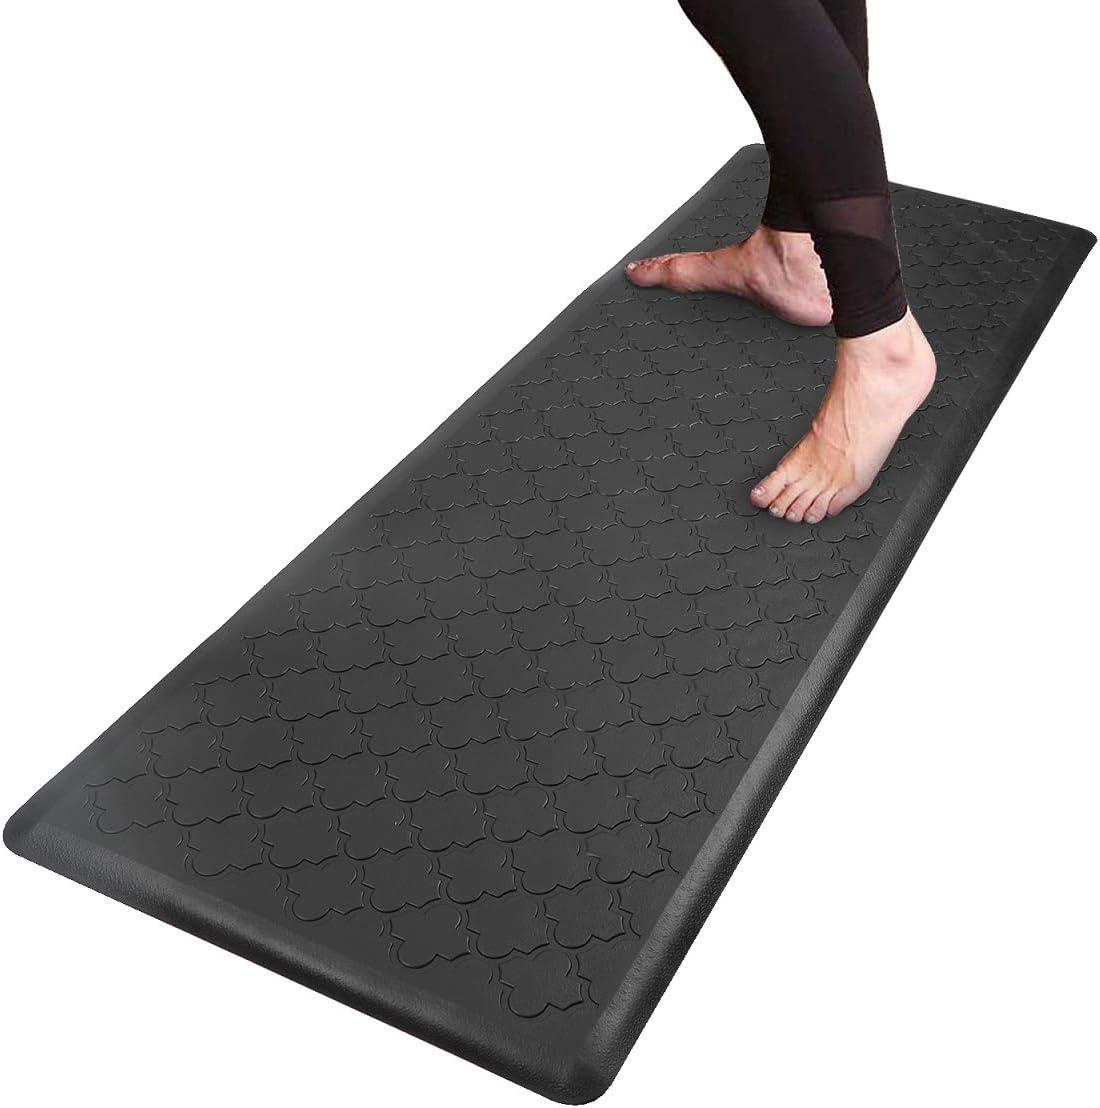 "HEBE Kitchen Mat Cushioned Anti-Fatigue Floor Mat Runner Waterproof Non-Slip Standing Mat Ergonomic Comfort Floor Mat Rug Runner for Office,Sink,Laundry,Desk,20""x60"""